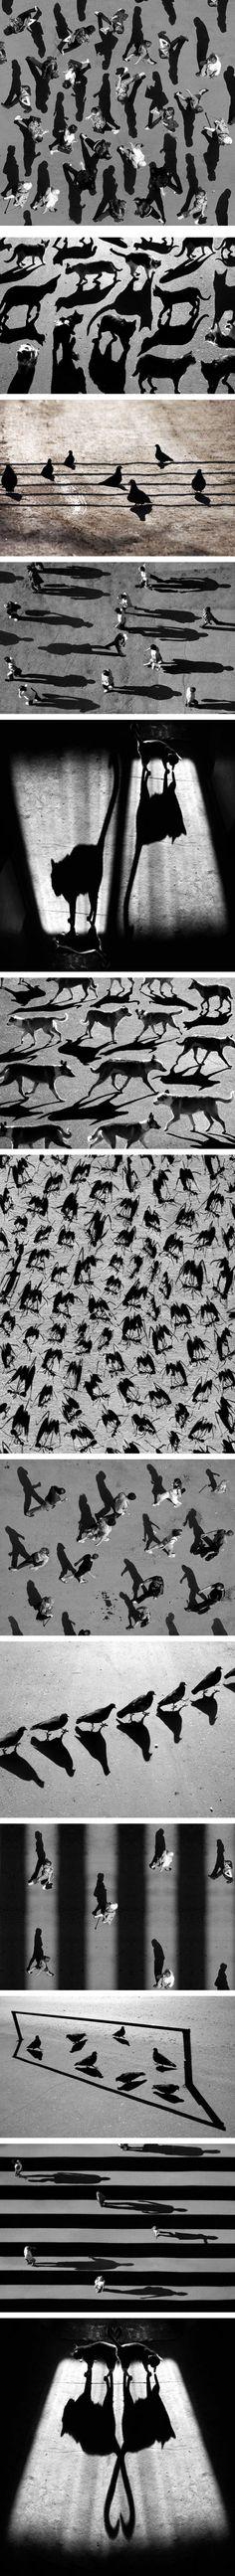 Alexey Bednij, les ombres photographiques > Creanum